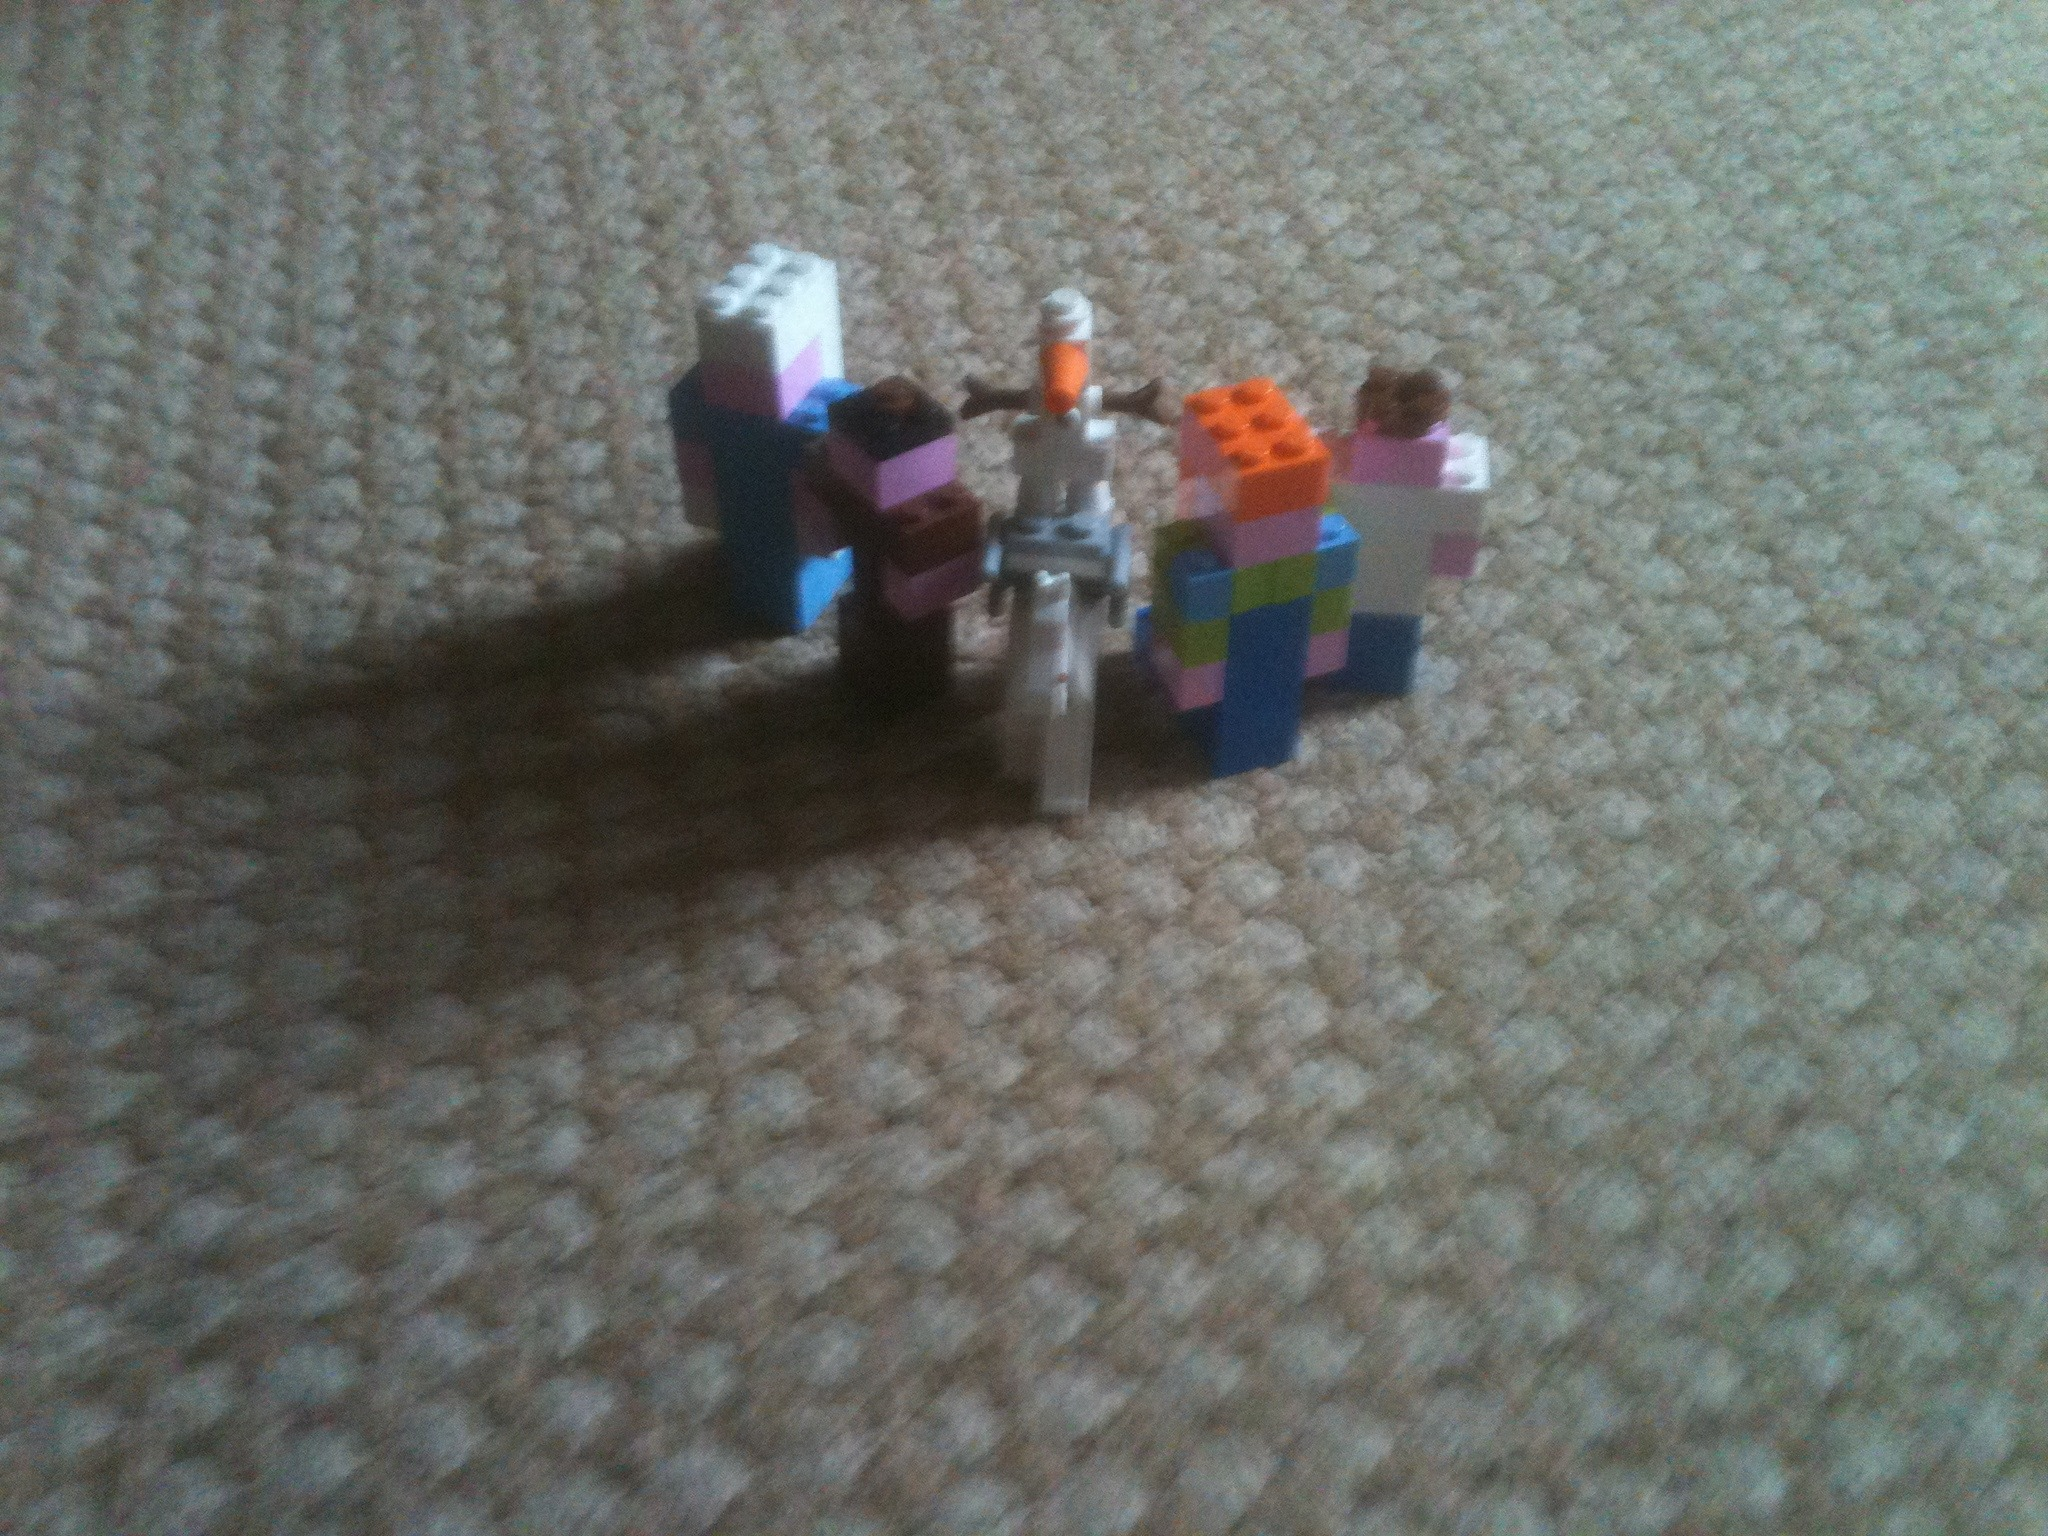 Lego Frozen Characters P2